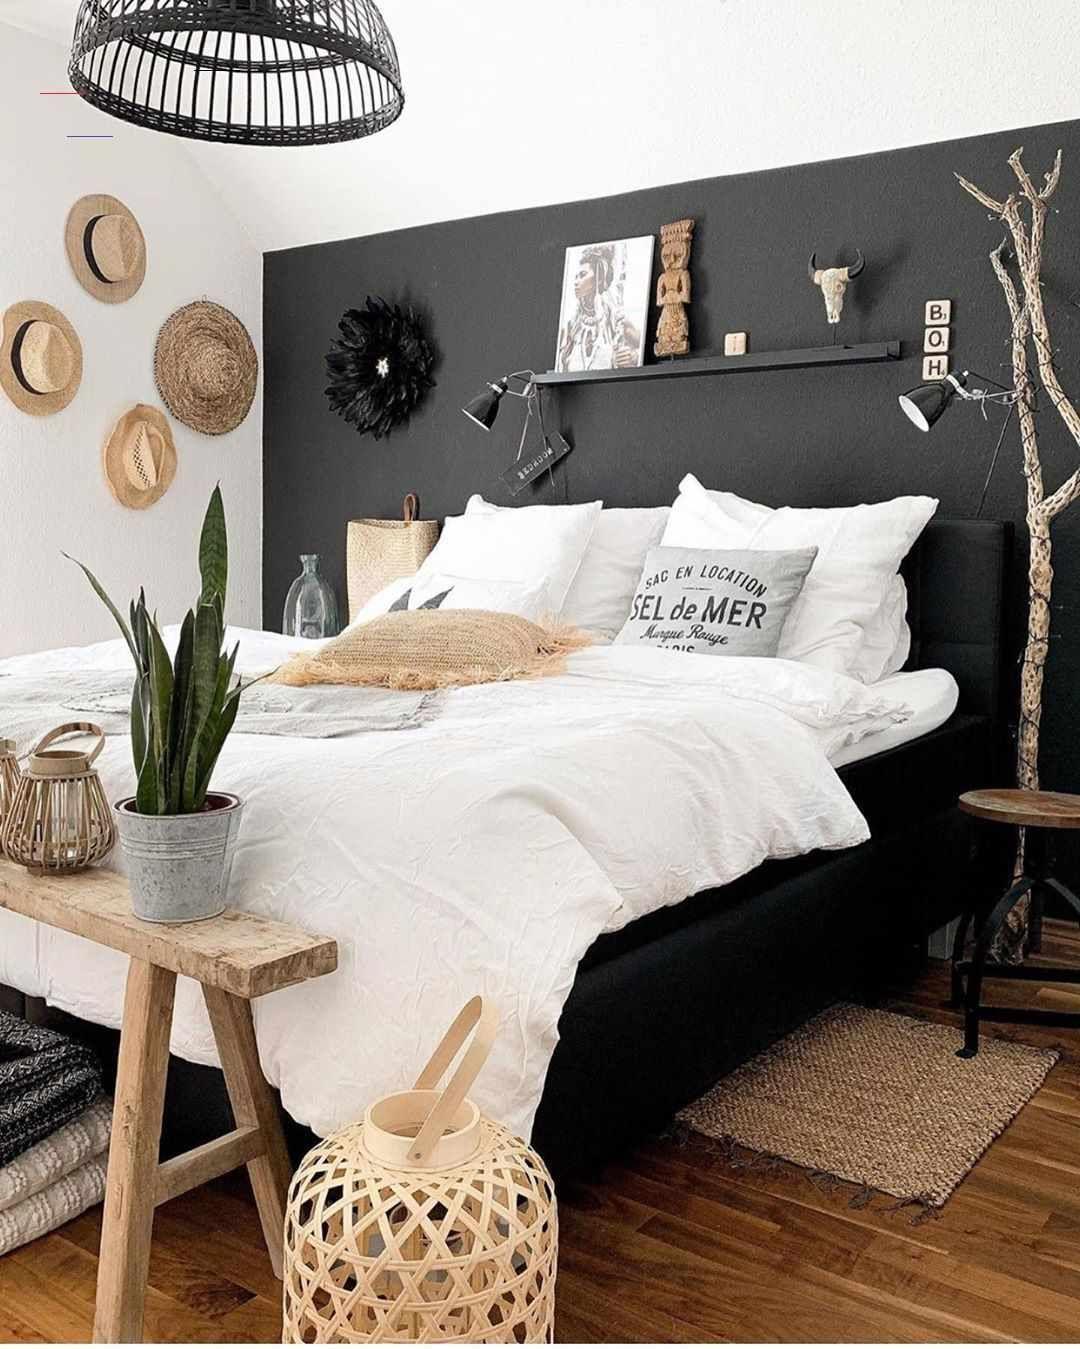 "Inspi_Deco on Instagram: ""️ Adult Room � Inspi @mikaswohnsinn #instagood #instalike #likephoto #picoftheday #room #roomdecor #adultroom #bedroom #bedroomdecor…"" - #chambrecocooning"